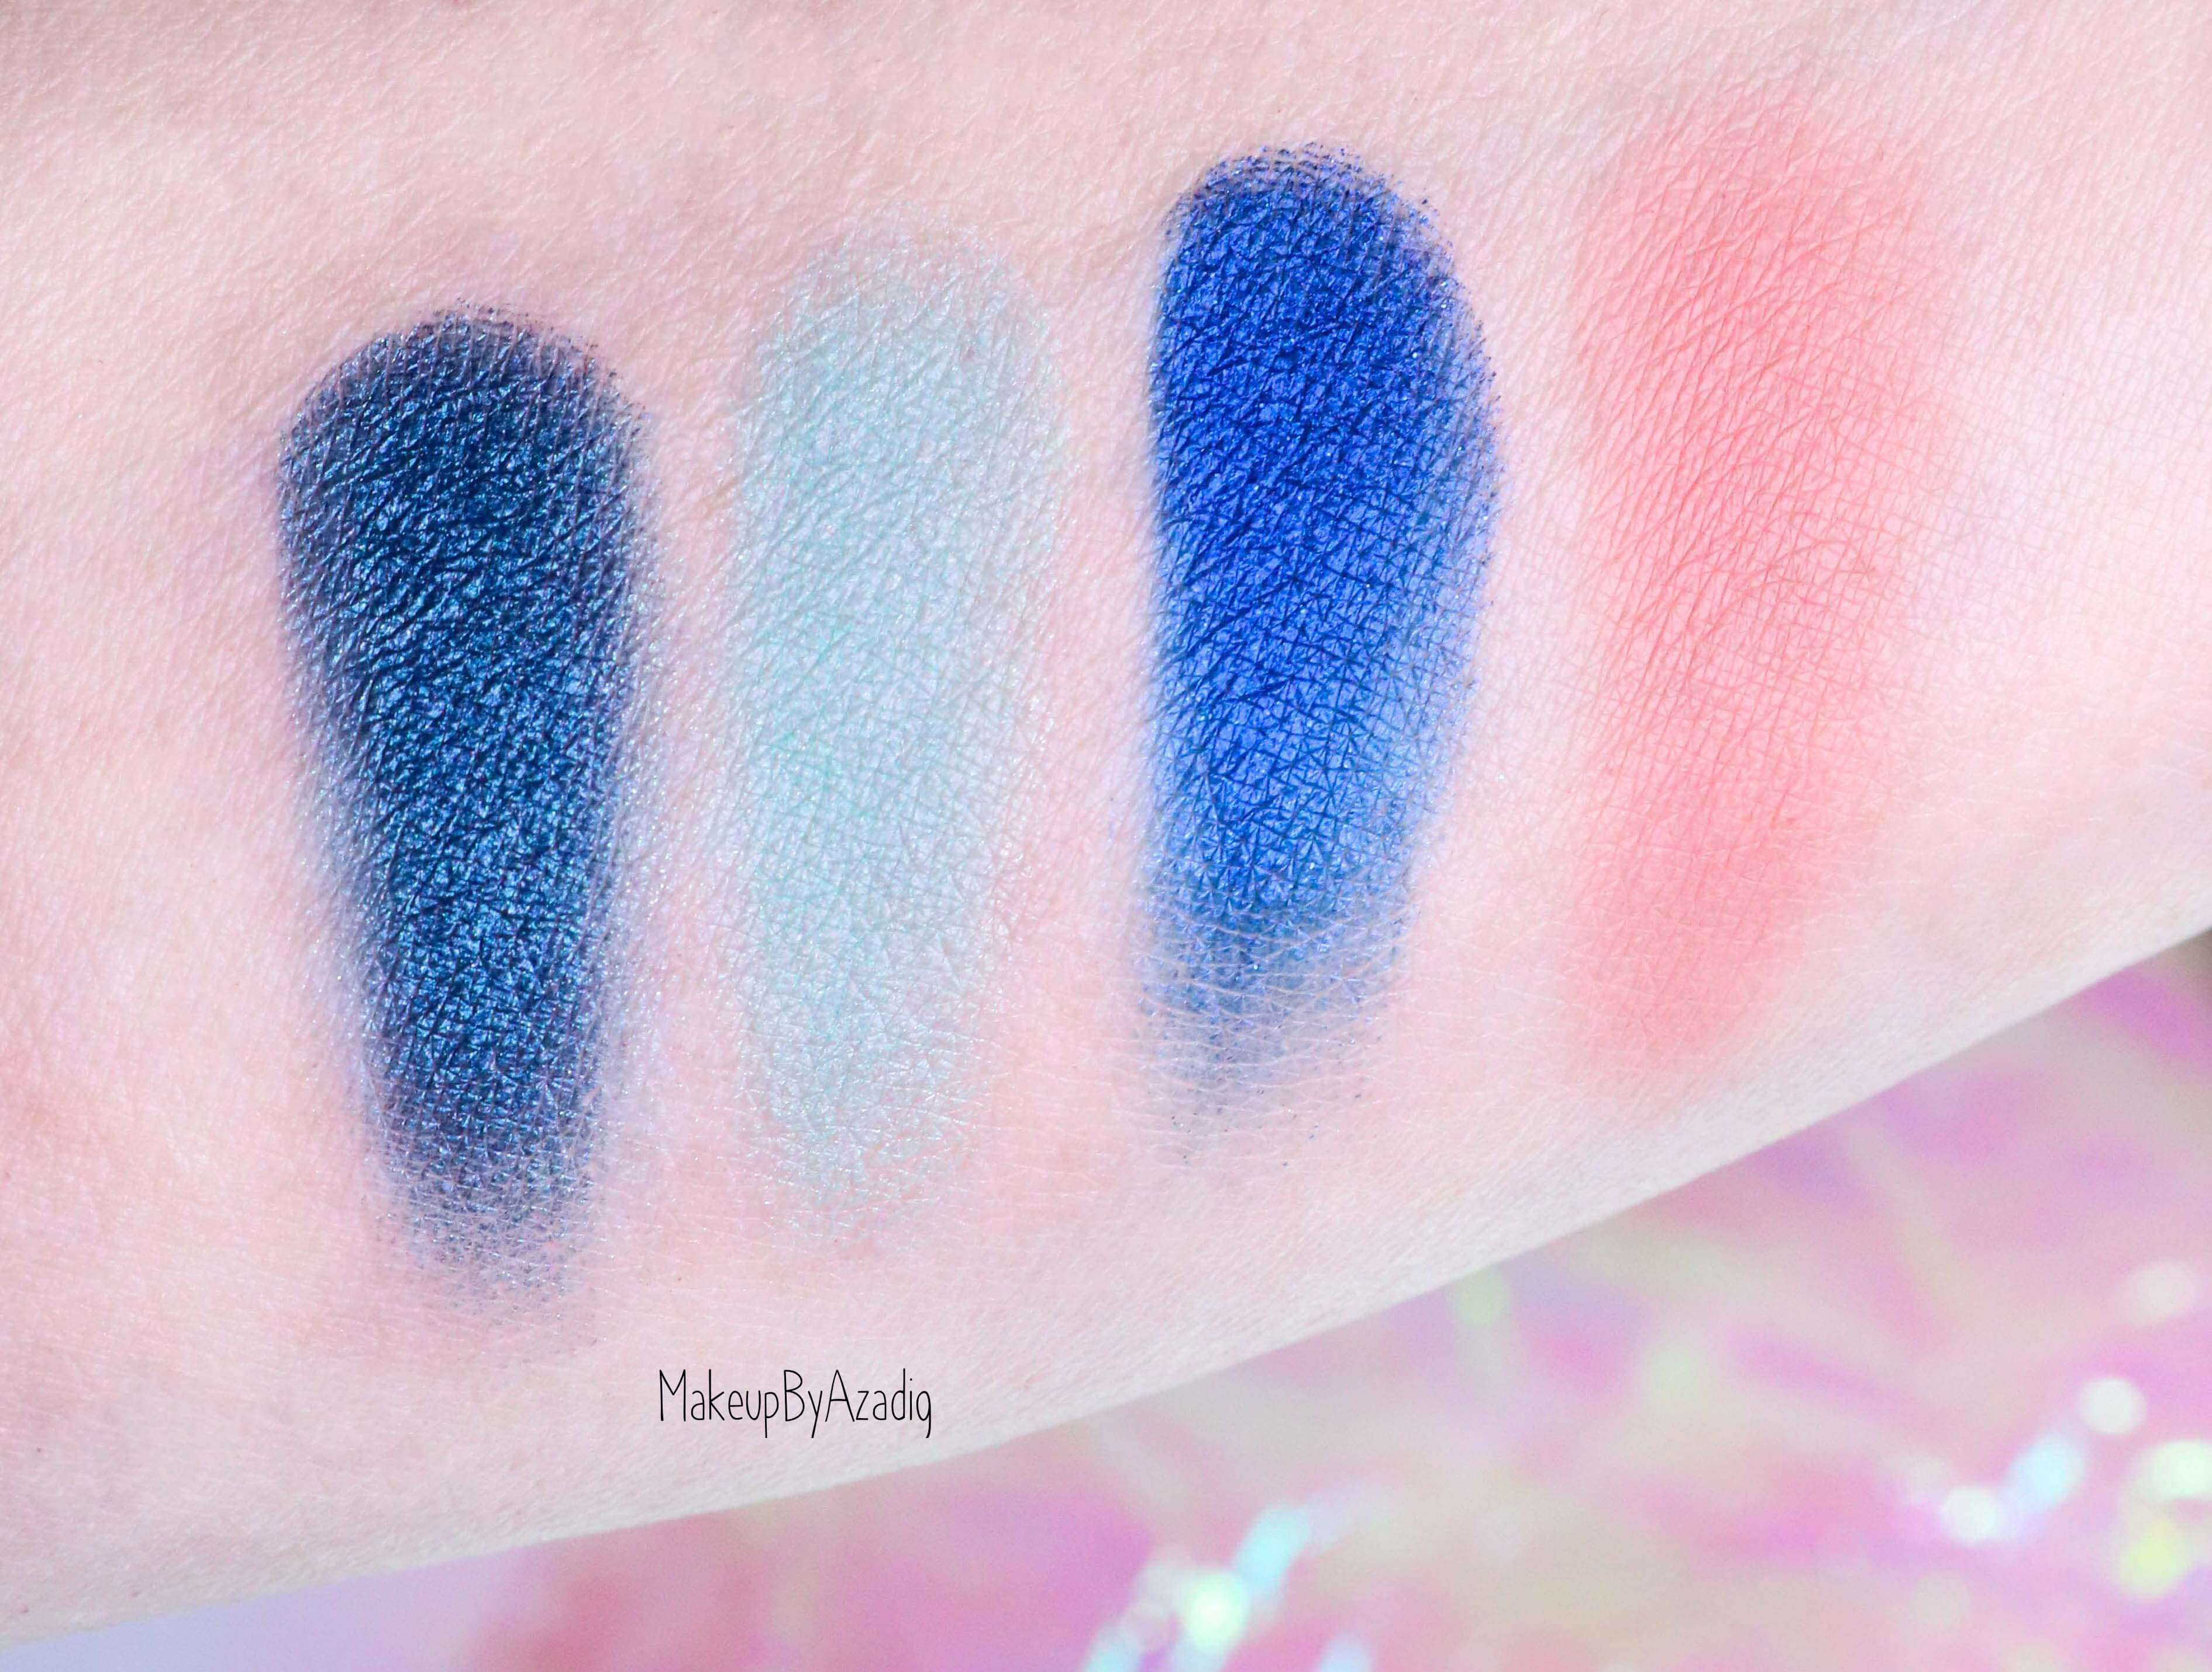 revue-palette-tarte-cosmetics-france-sephora-makeupbyazadig-swatch-prix-avis-rainforest-of-the-sea-swatch-blue-2